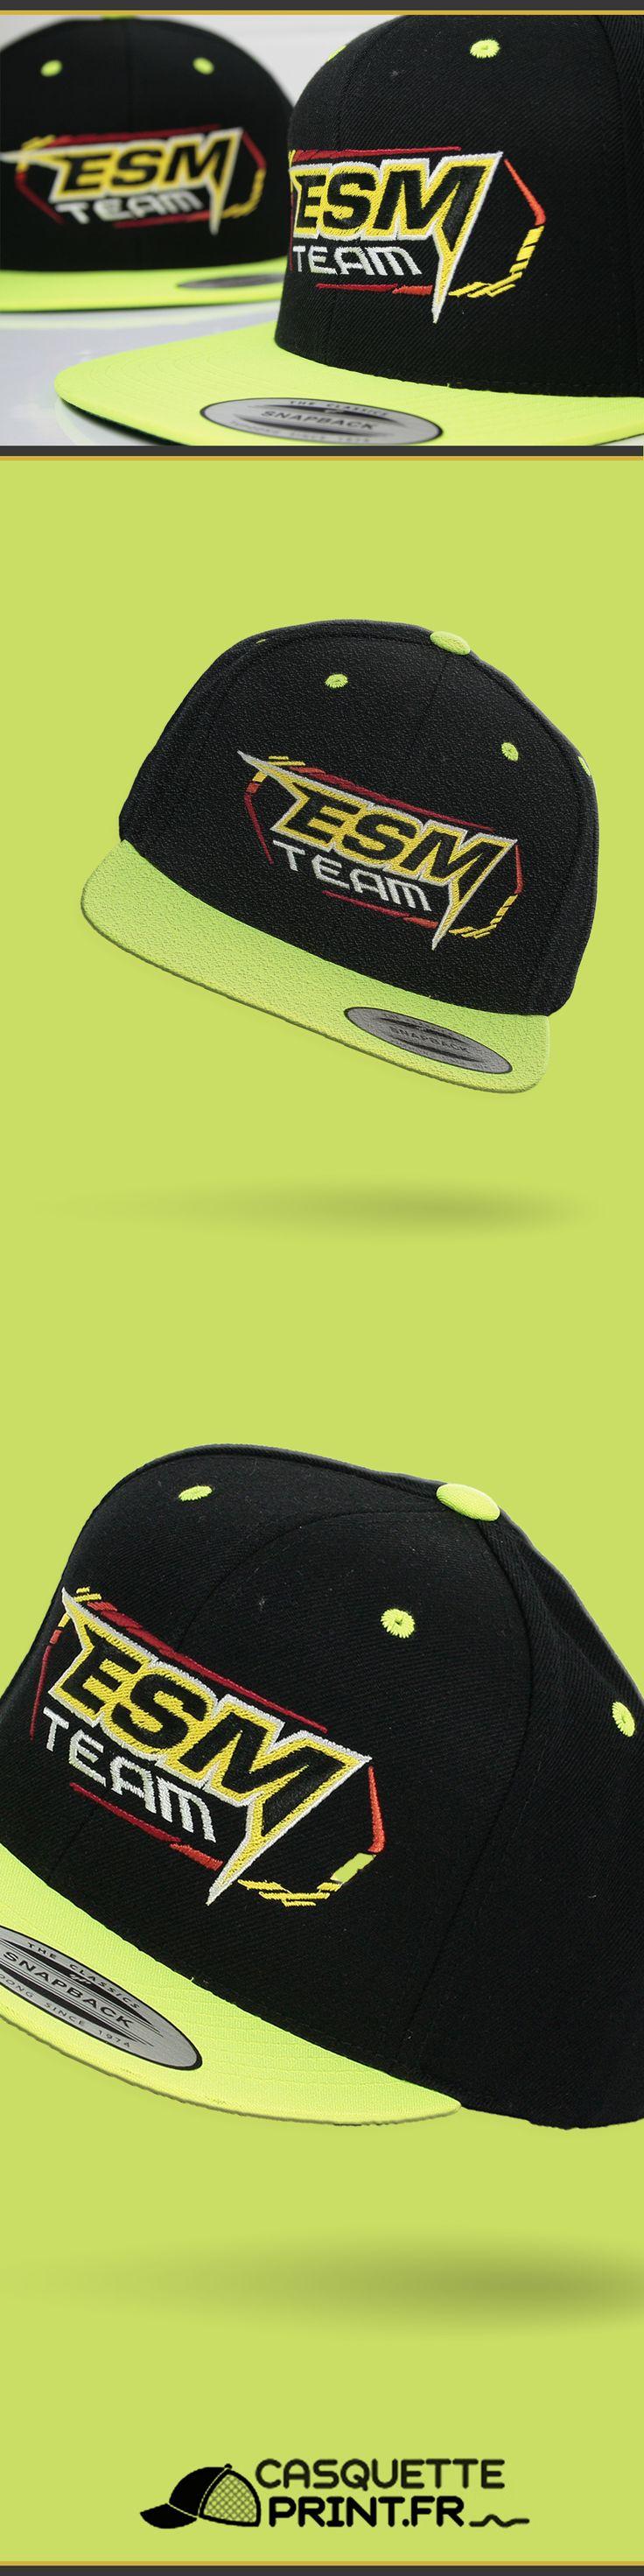 #entreprise #casquette #bonnet #trucker #personnaliser #snapback #yupoong #particulier #personnalisation #goodies #mode #fashion #association